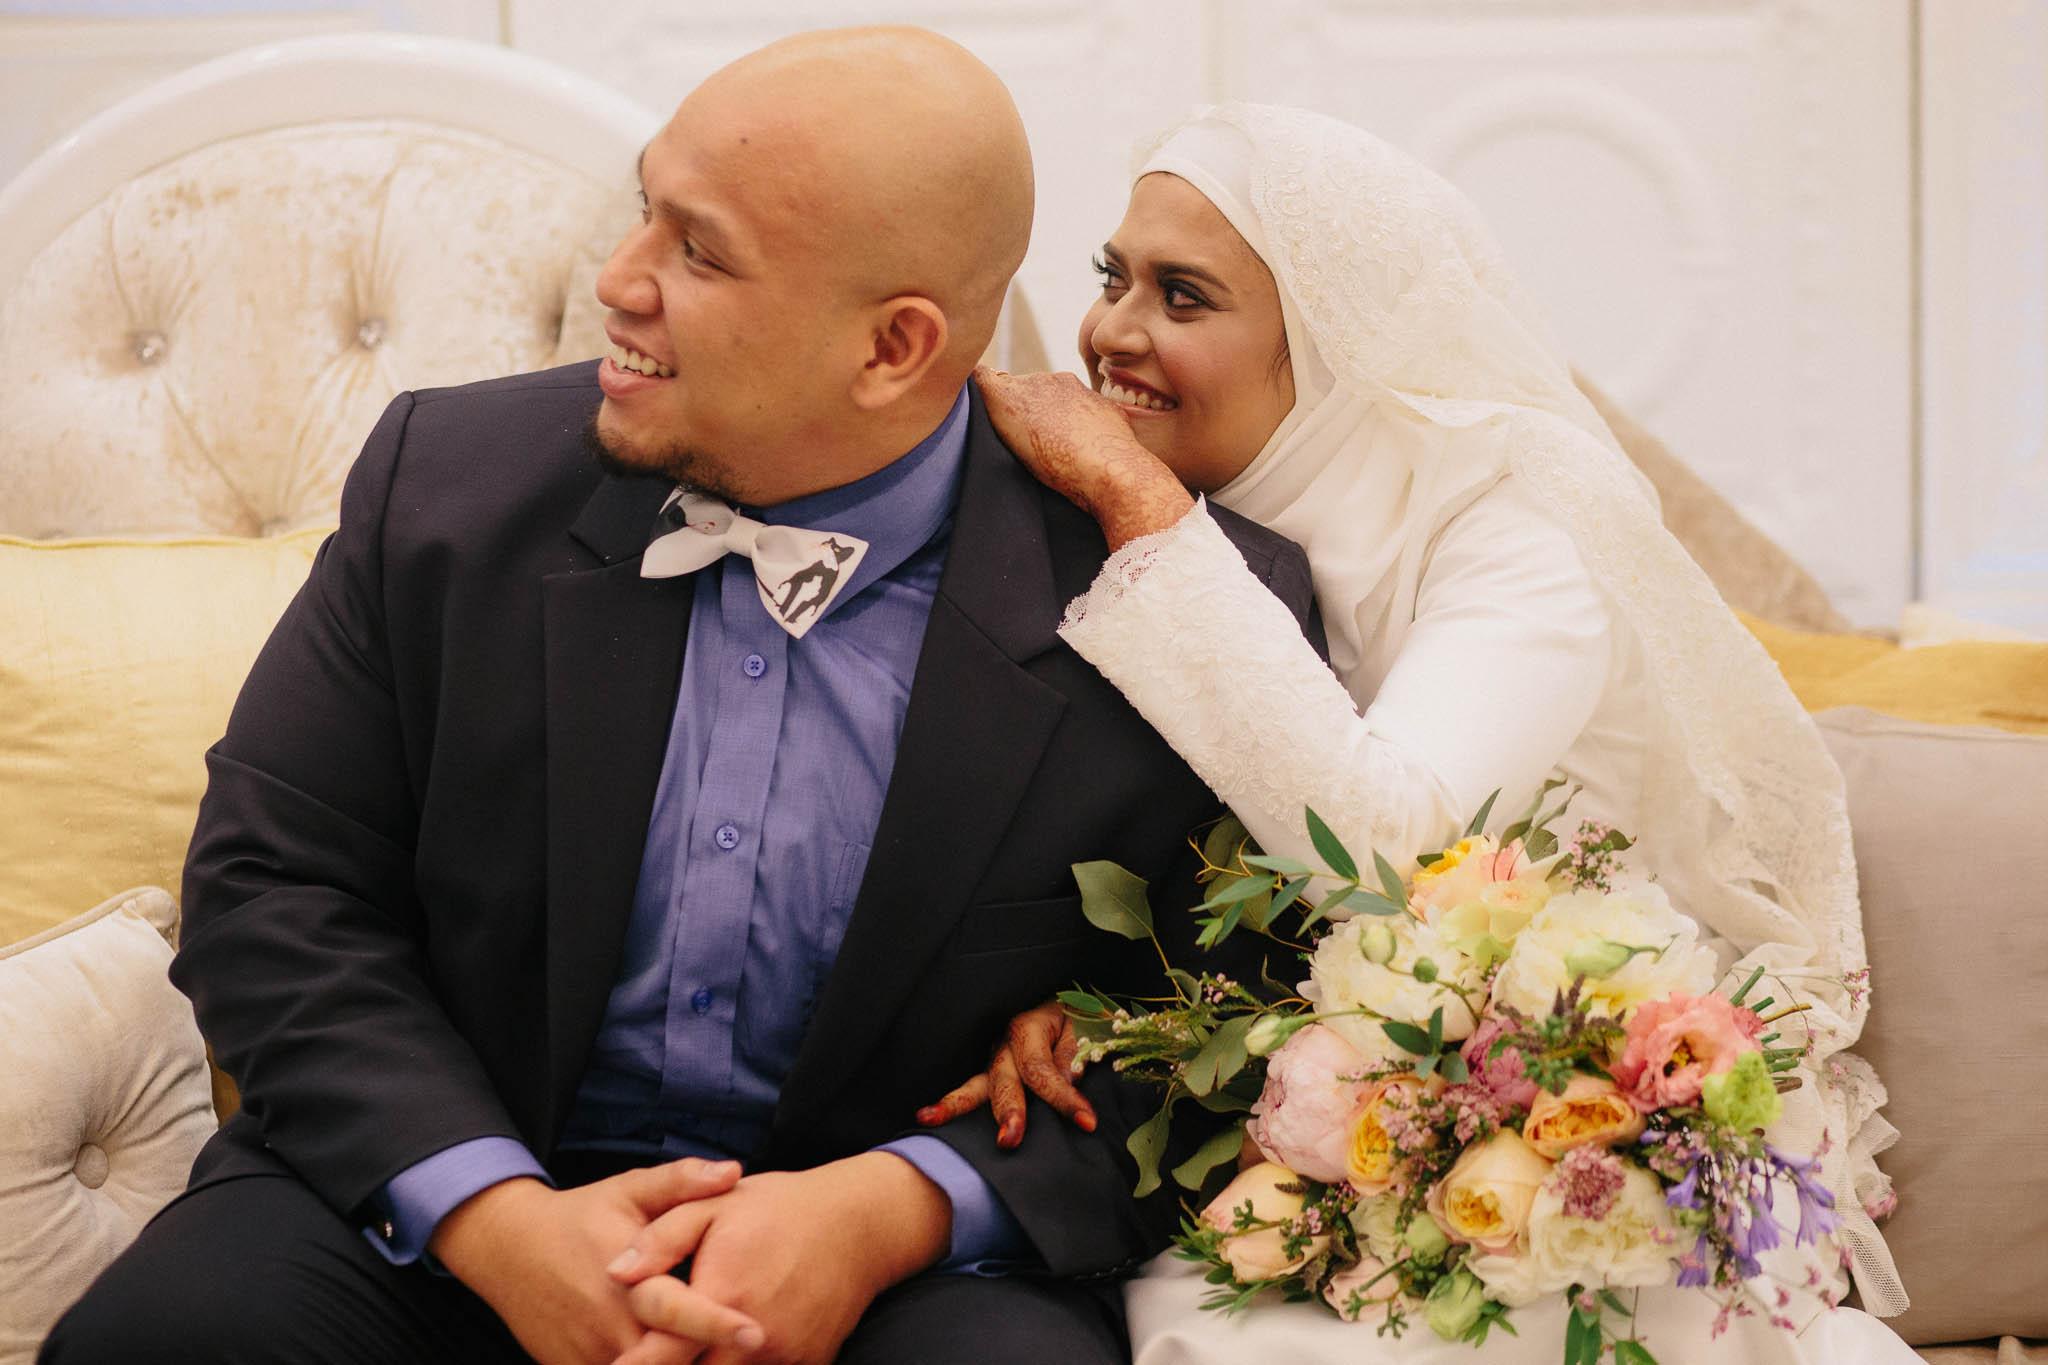 singapore-wedding-photographer-malay-indian-pre-wedding-travel-wmt-2015-shereen-farid-58.jpg